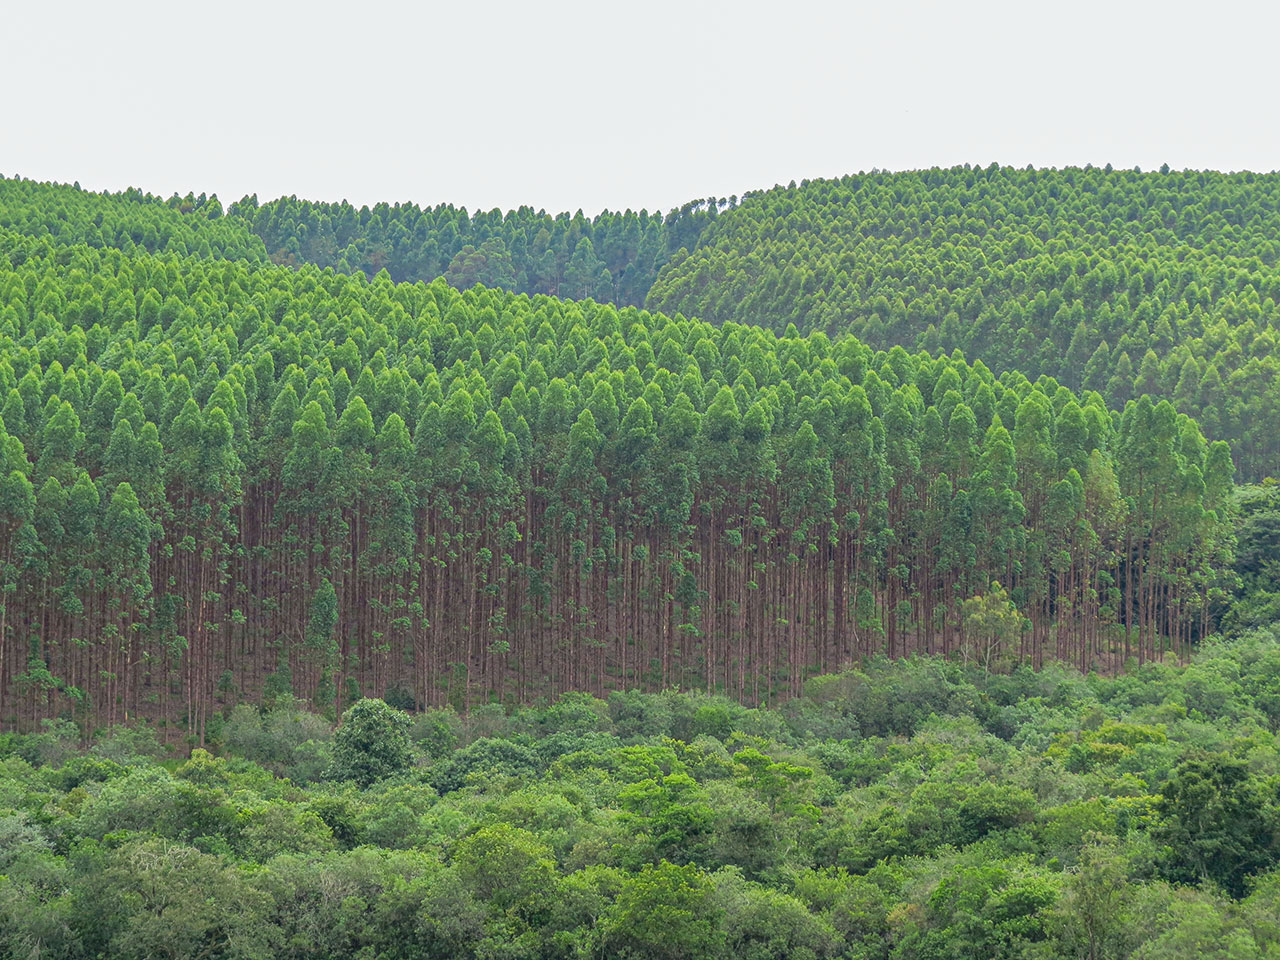 Forest plantation in Brazil